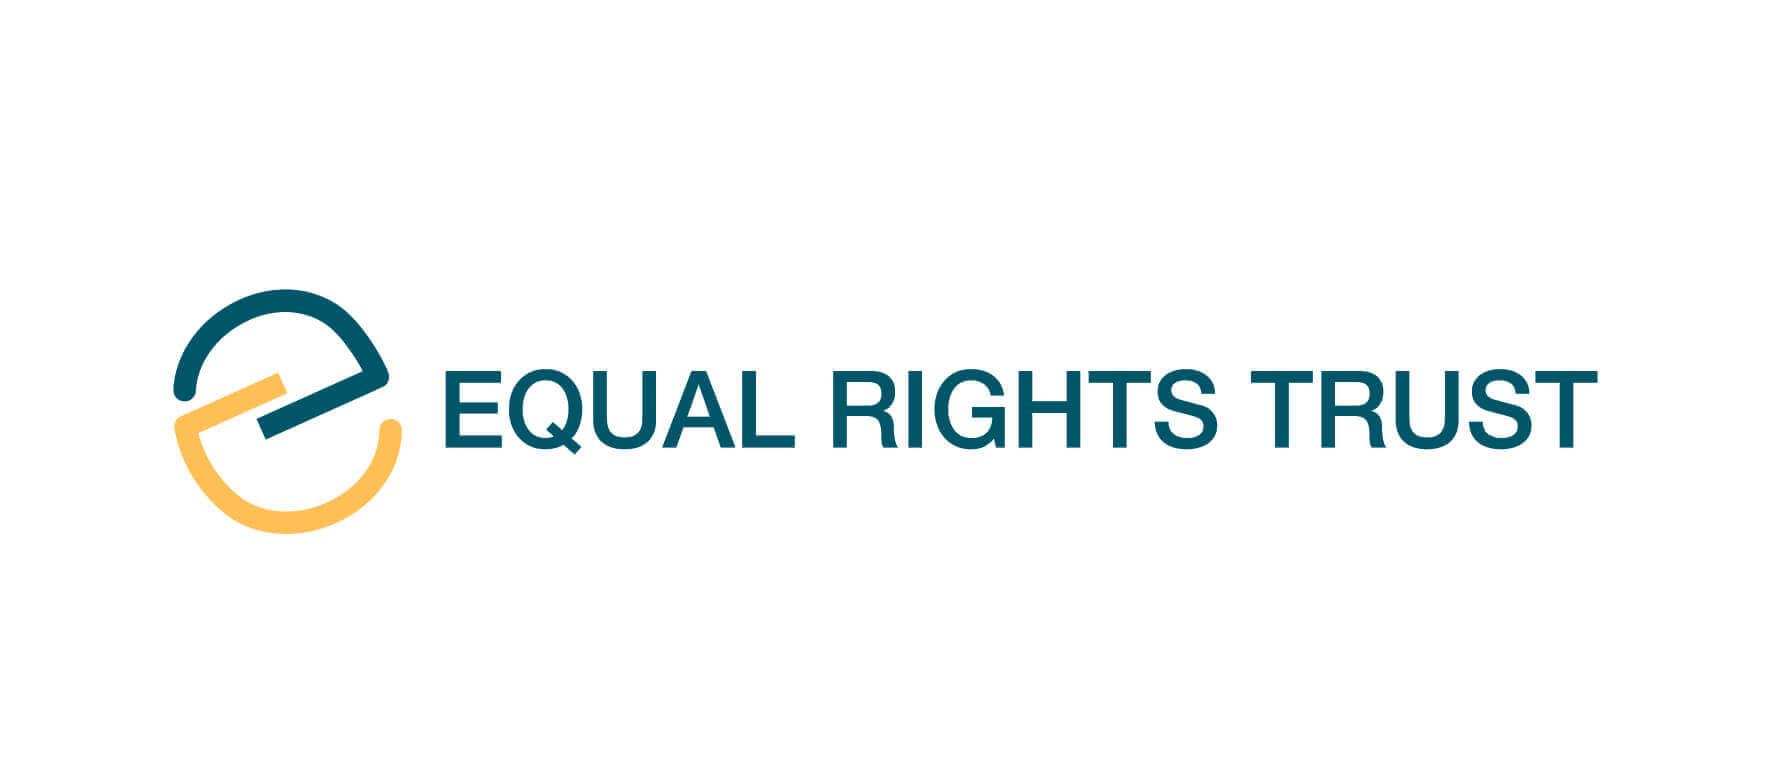 Bob Hepple Equality Award Ceremony – Thursday 12th September 2019, London